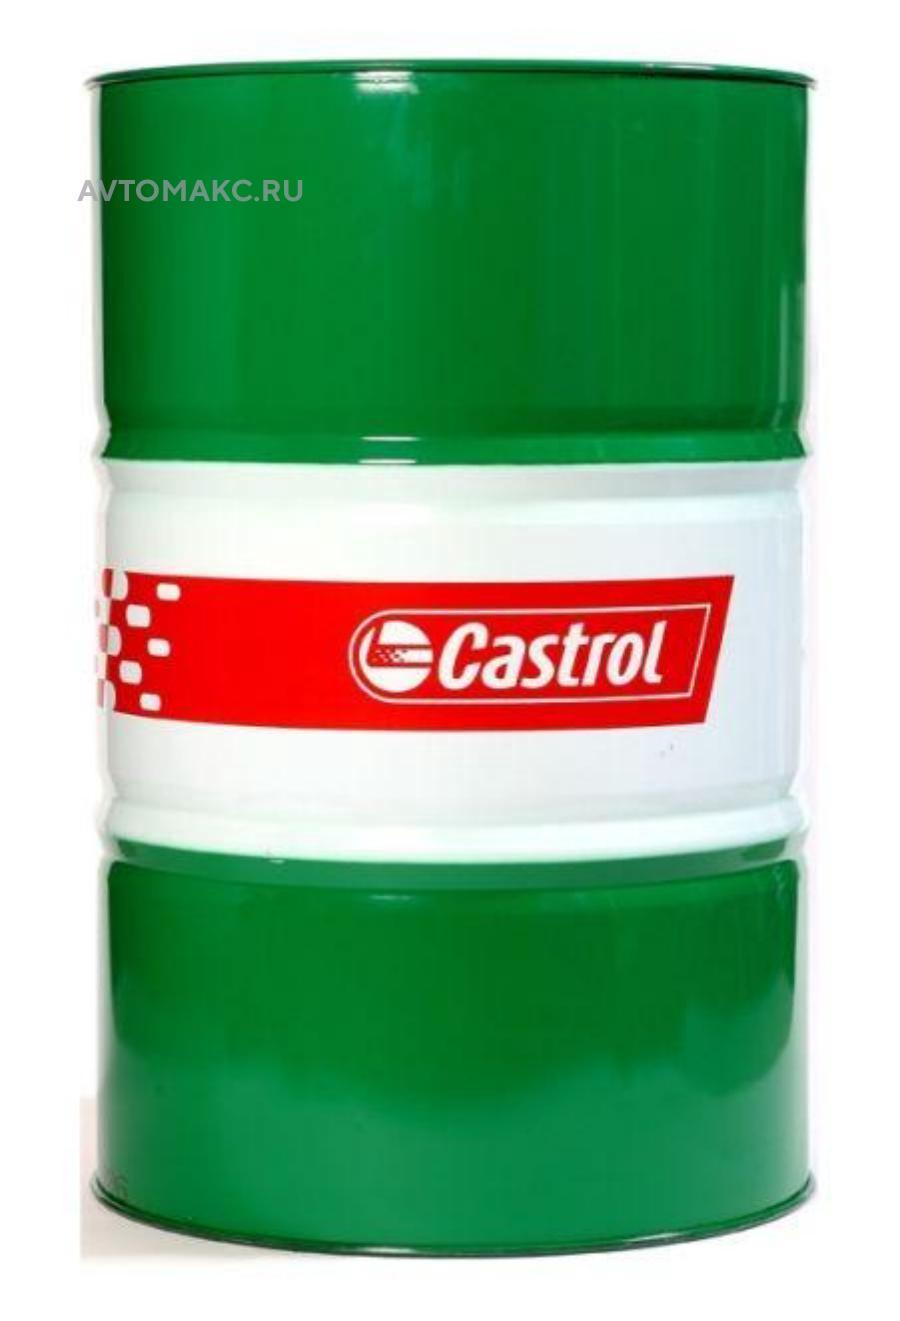 CASTROL 15BFA7 Масло моторное Castrol EDGE С3 5W30 синтетическое 60 л 15BFA7